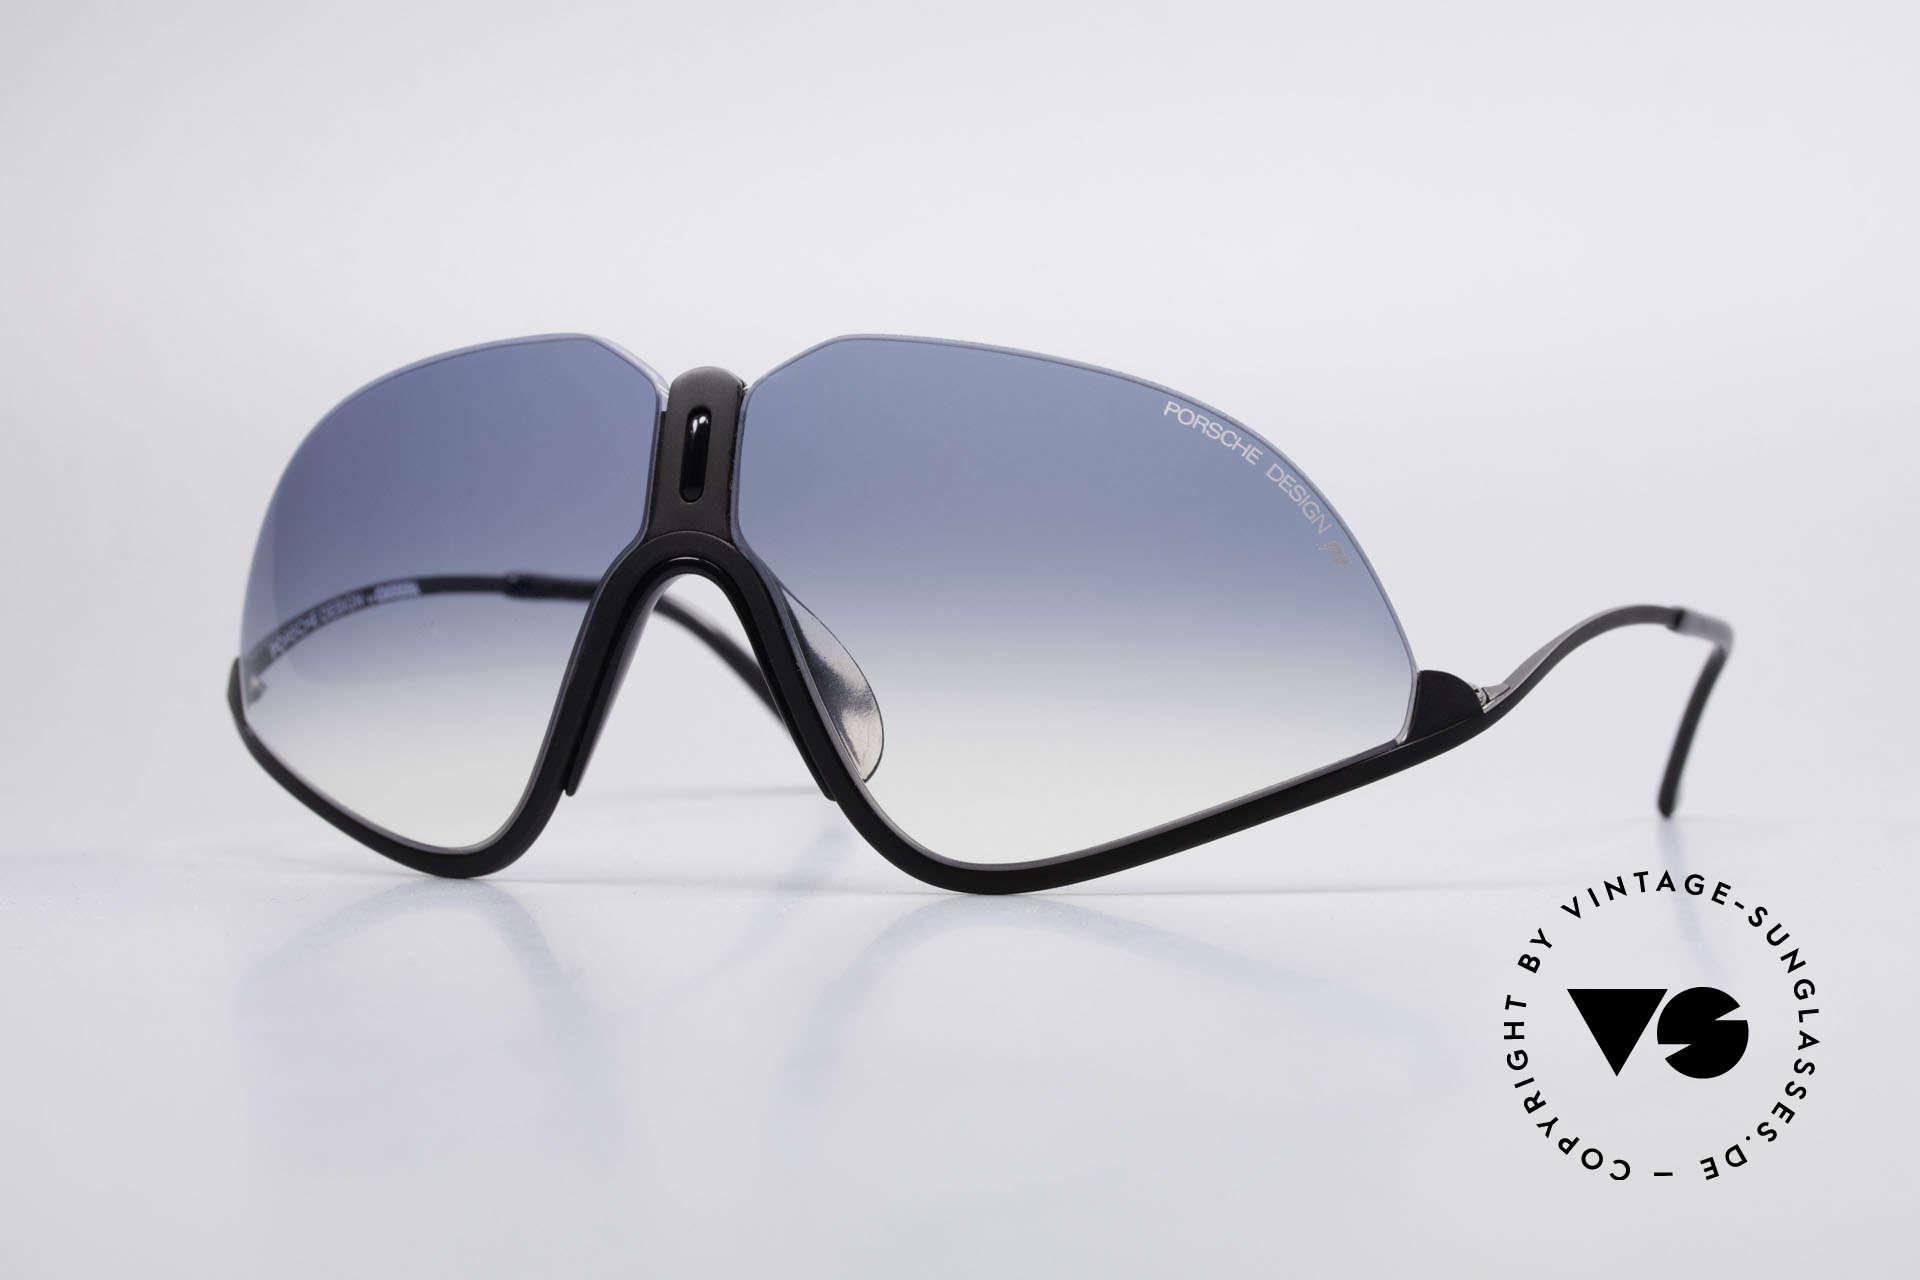 Porsche 5630 90's Designer Sports Shades, rare Porsche Design sunglasses from the early 1990's, Made for Men